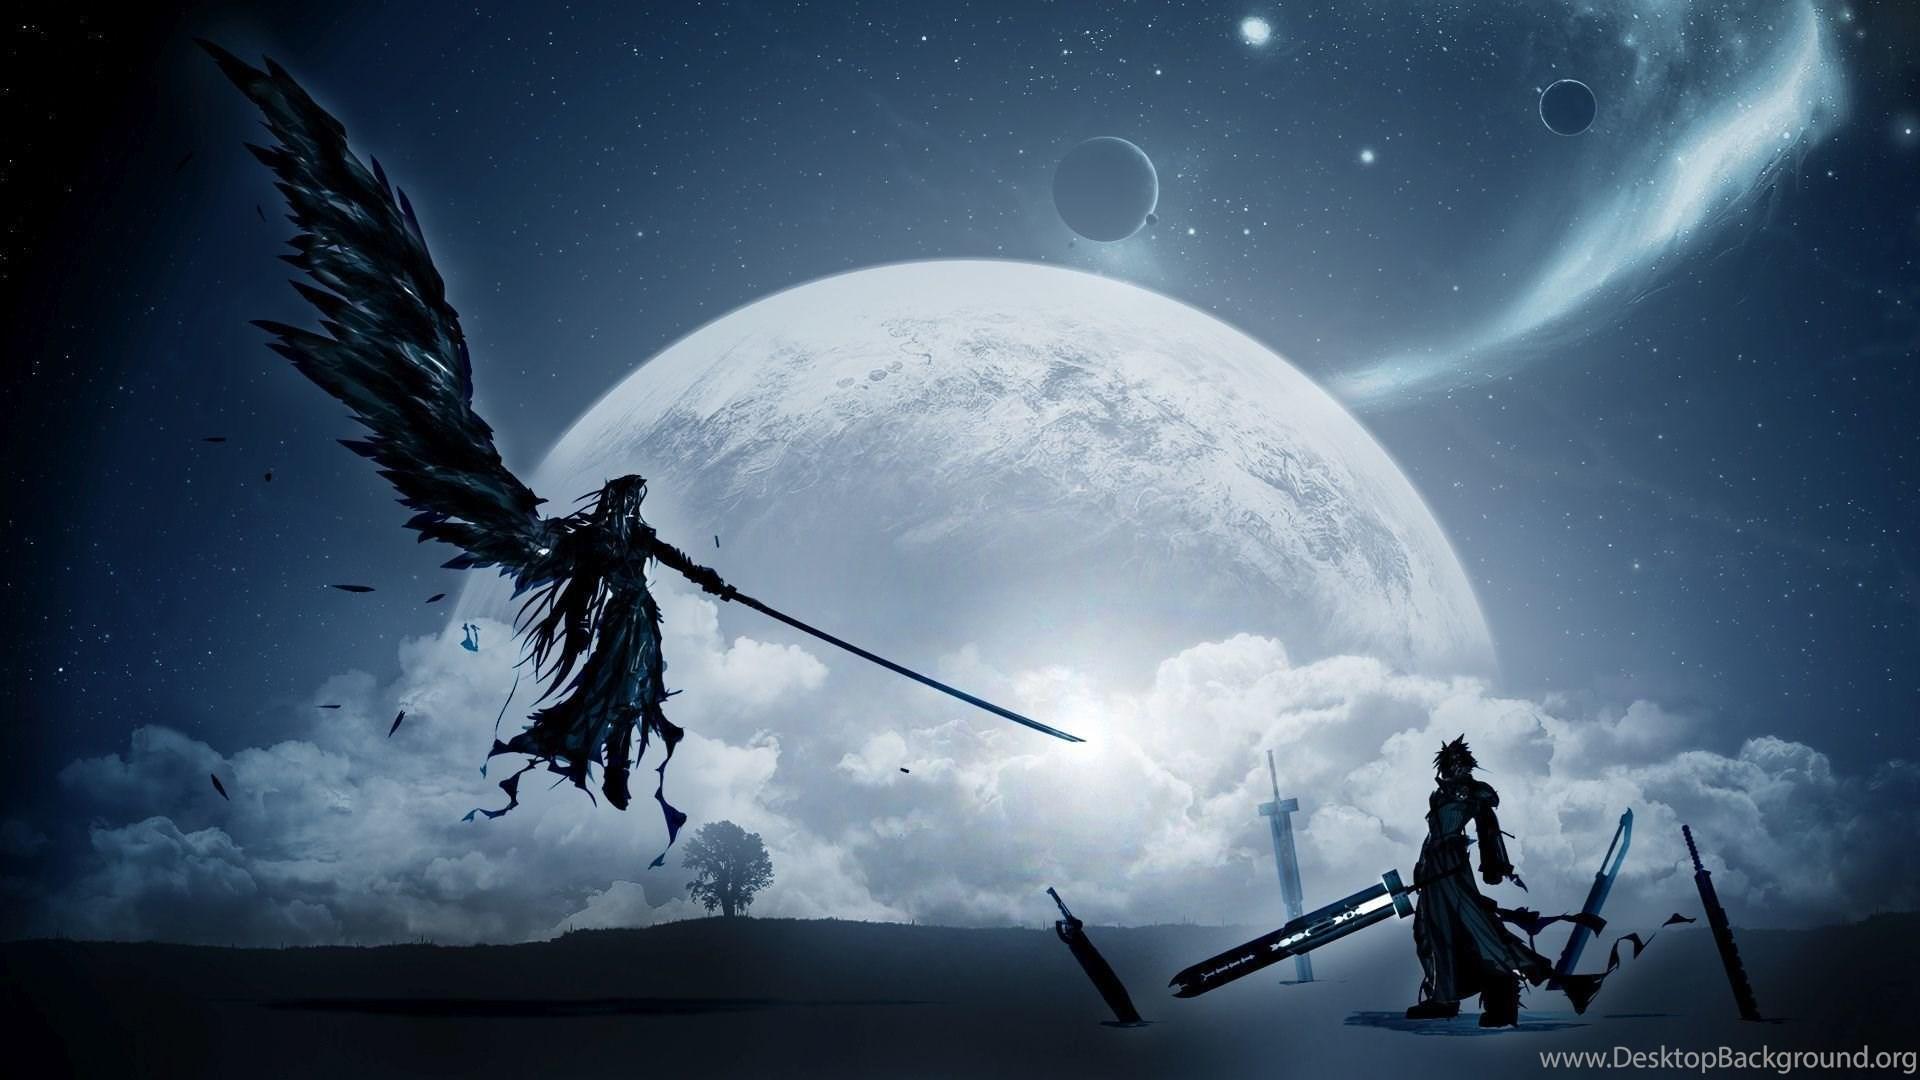 Final Fantasy Vii Game Hd Wallpaper 1920x1080 35393 Jpg Desktop